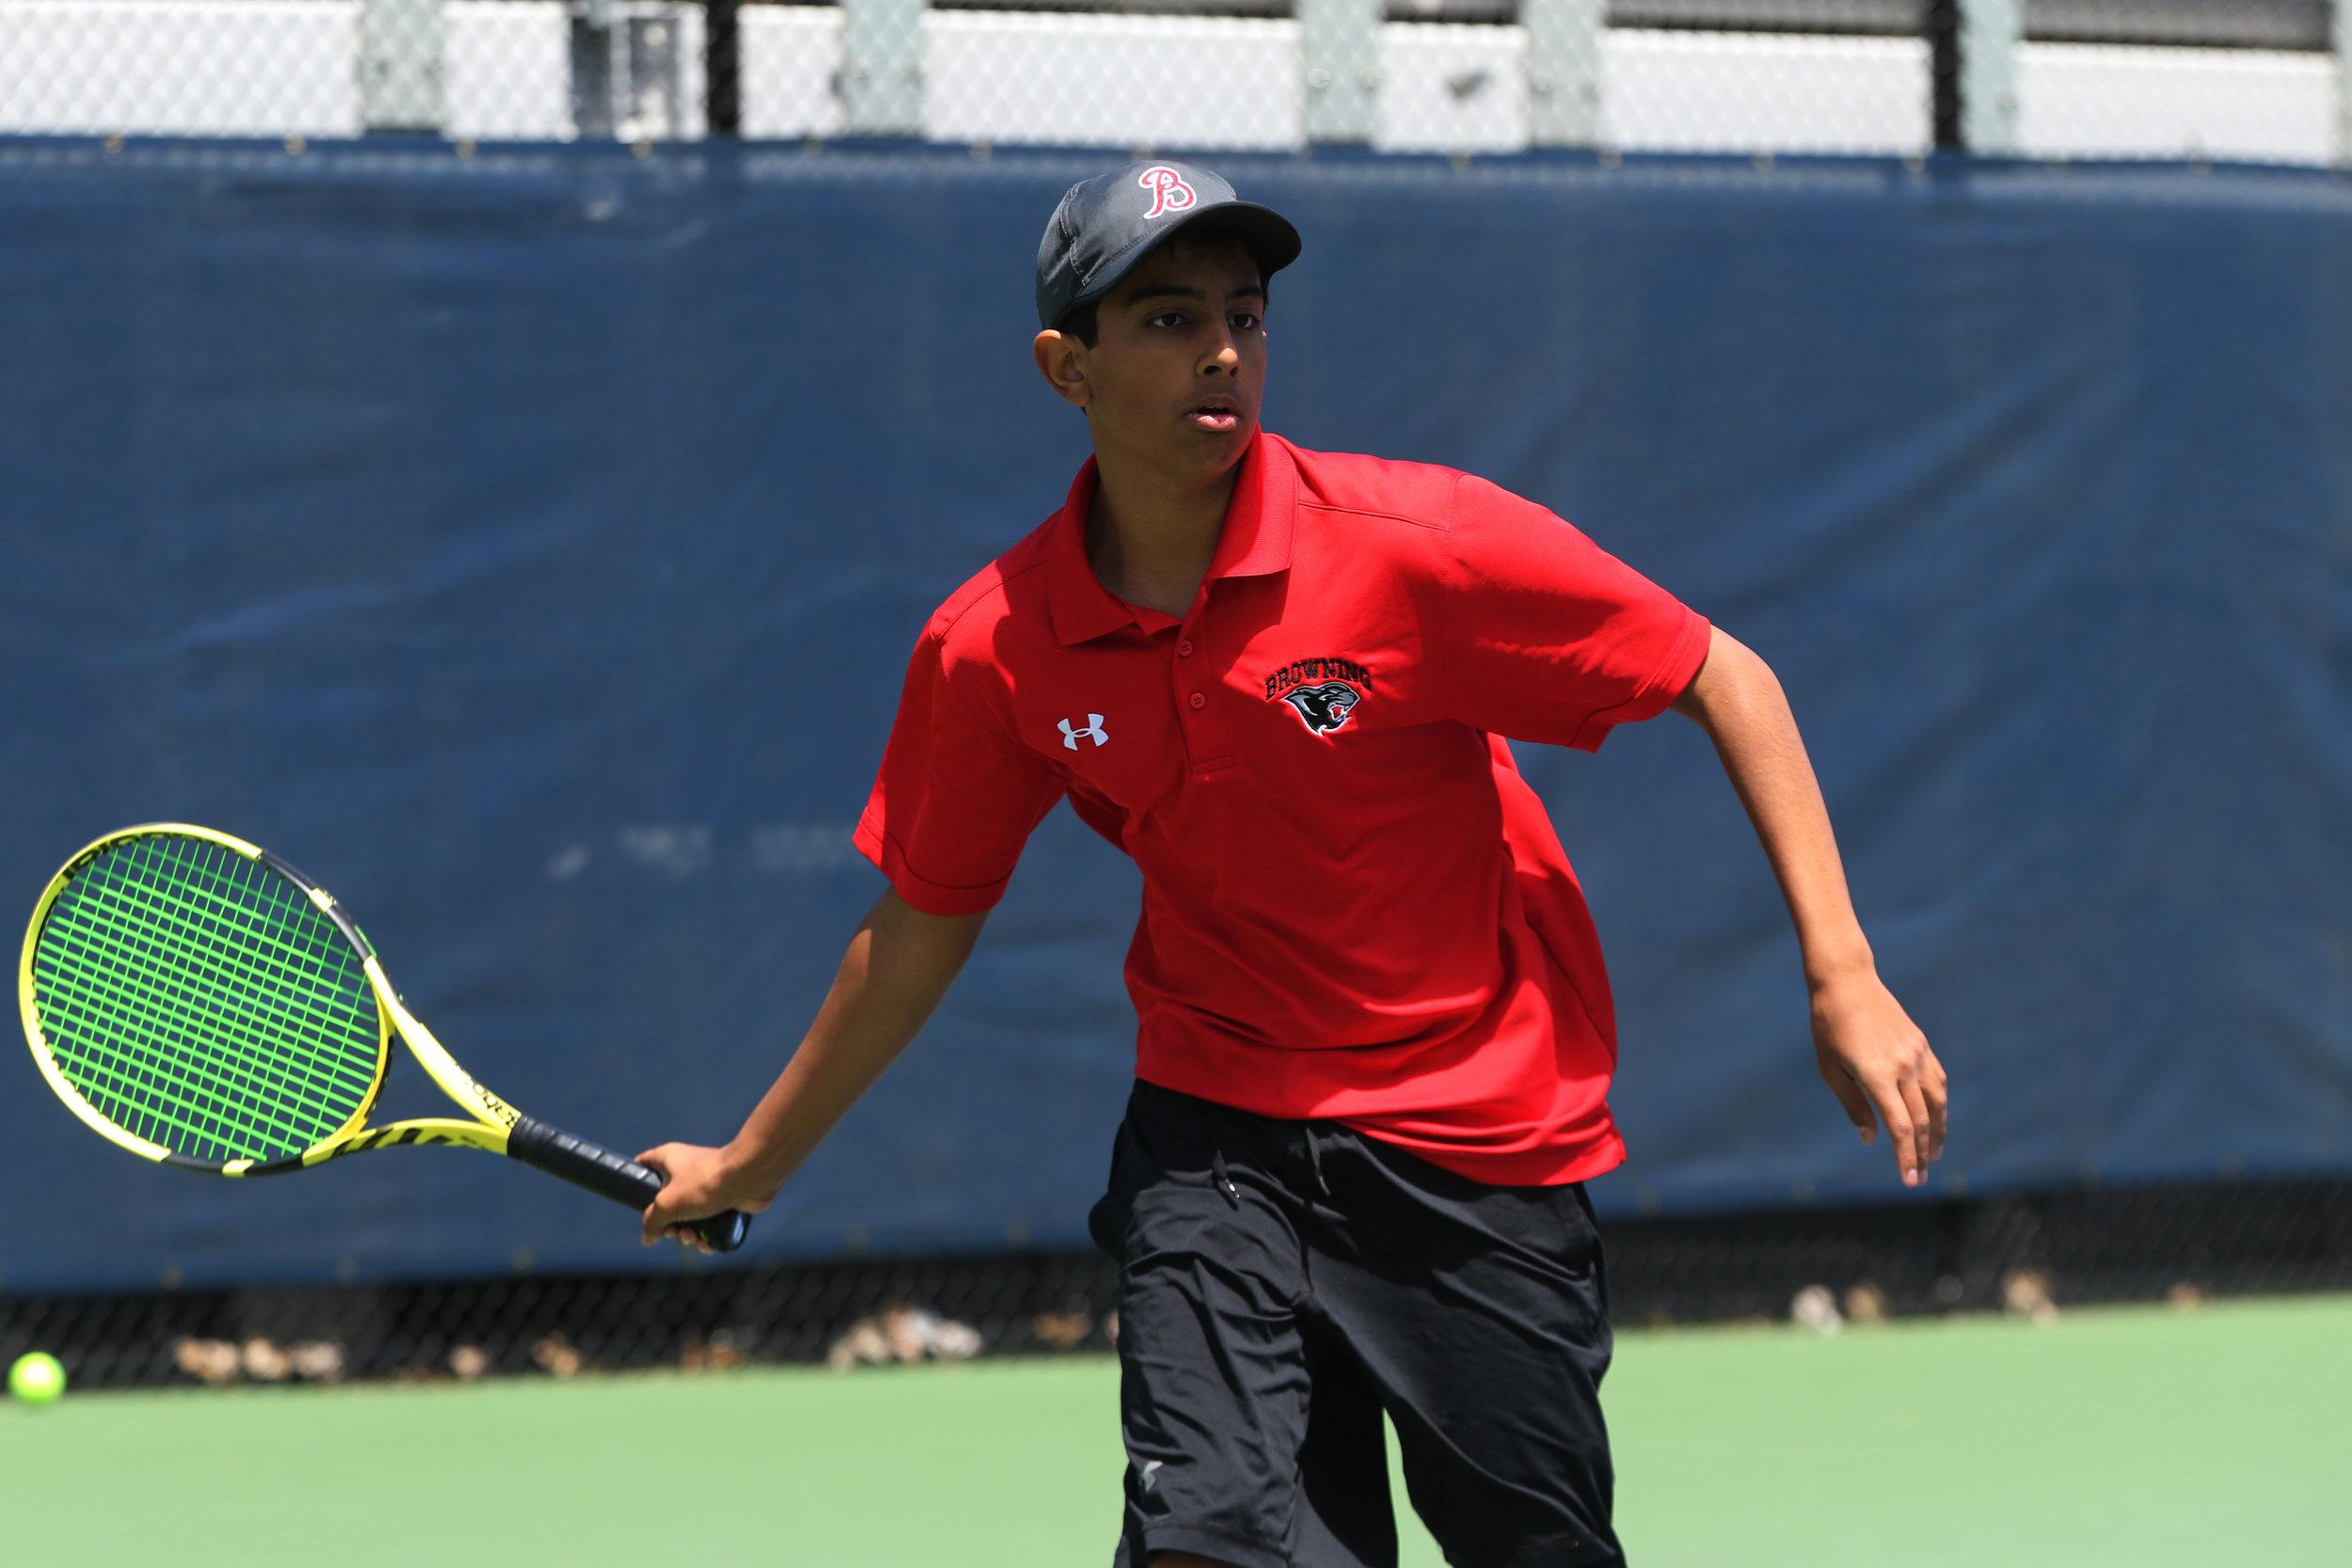 NYCAL Tennis Championships 051519-Al Pereira (749).JPG